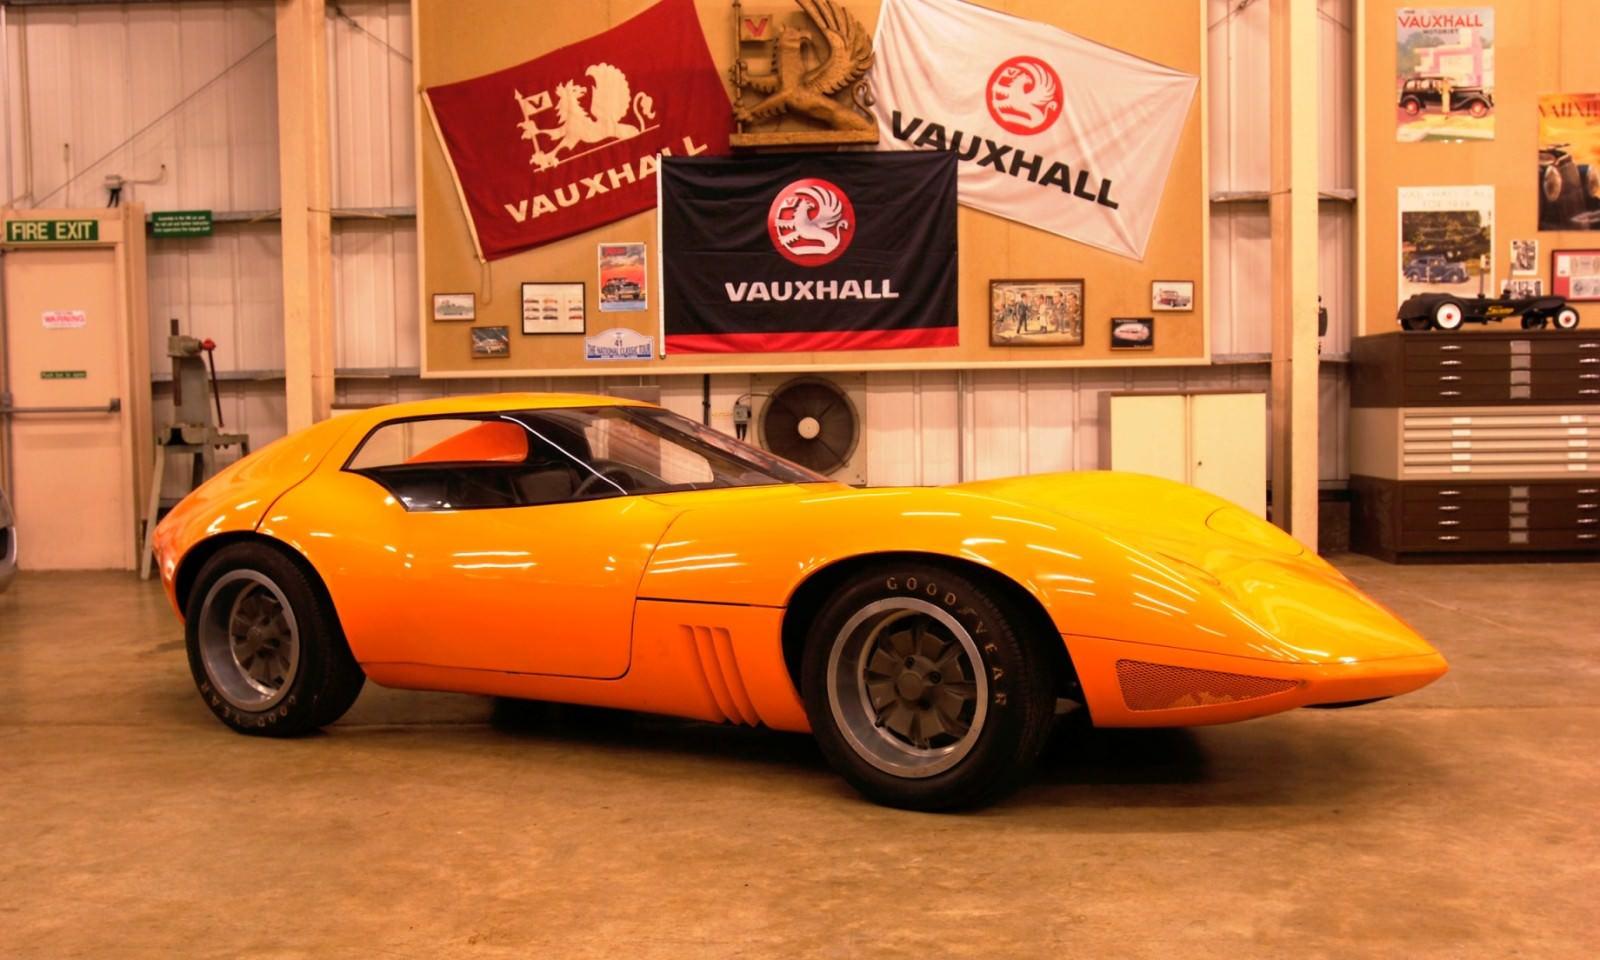 1973 Vauxhall Firenza 2